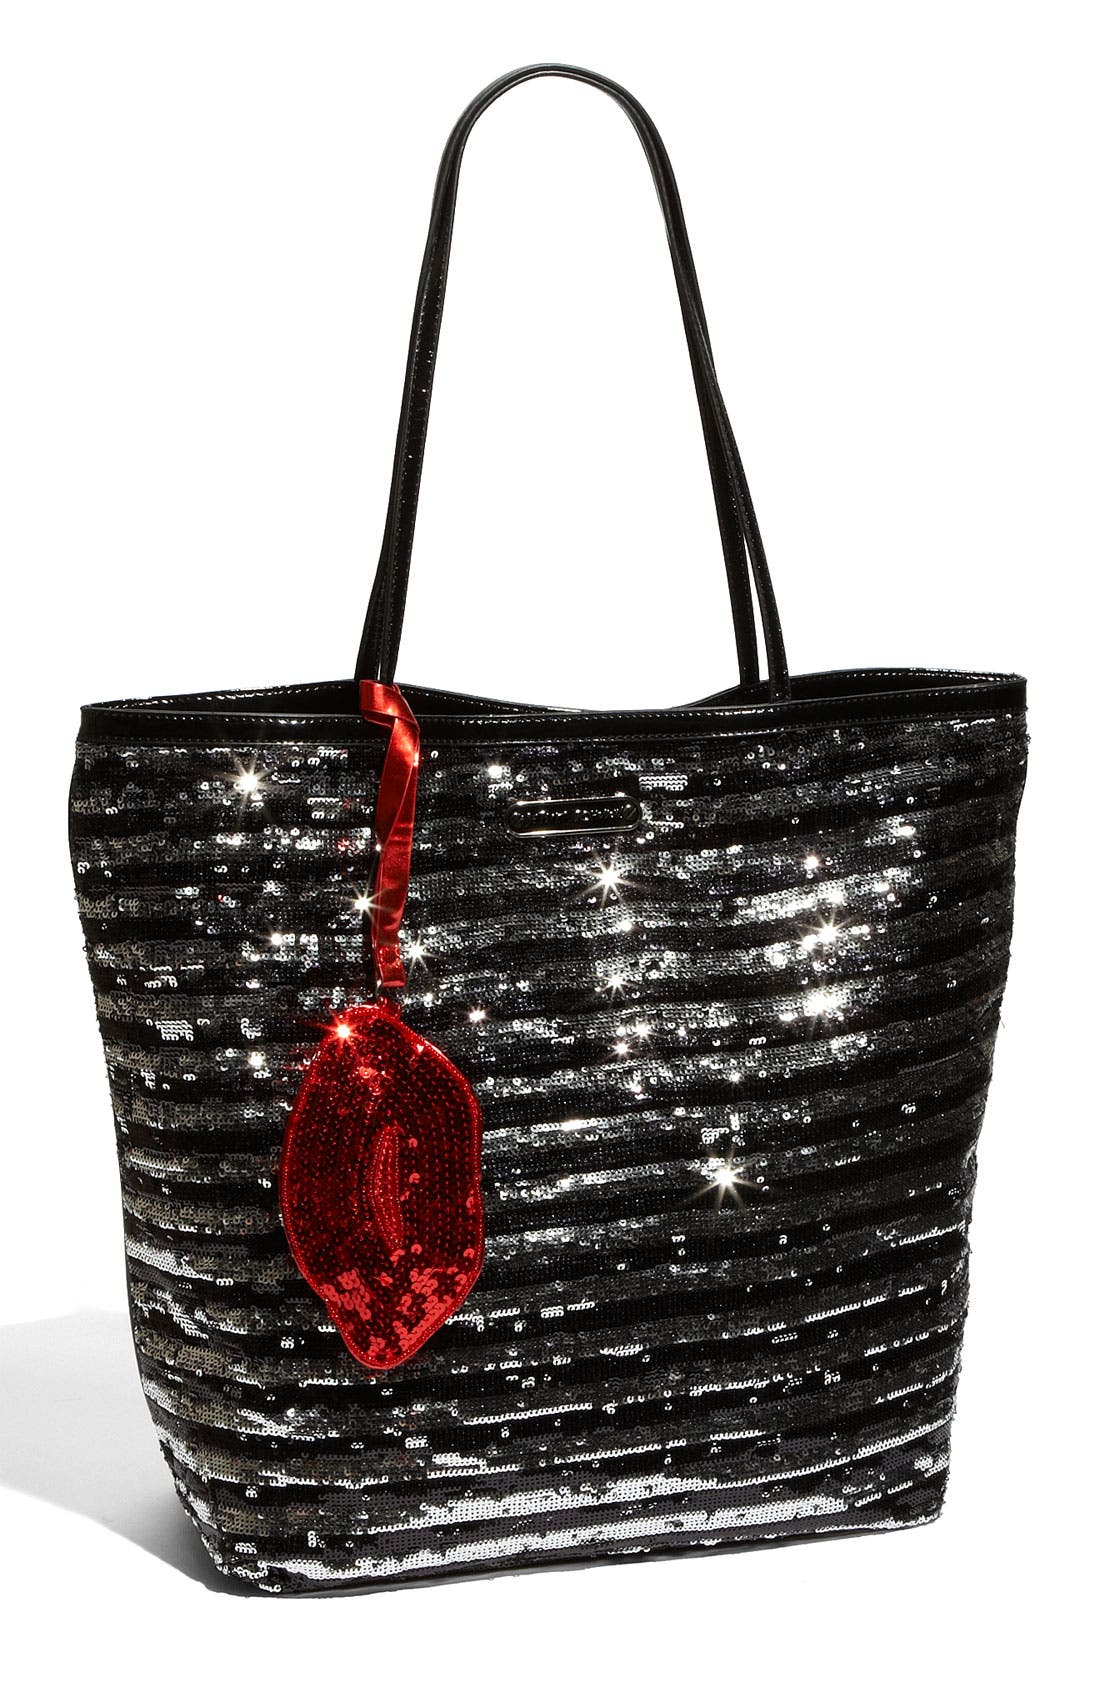 Main Image - Betsey Johnson 'Glitzed - Medium' Sequined Shopper